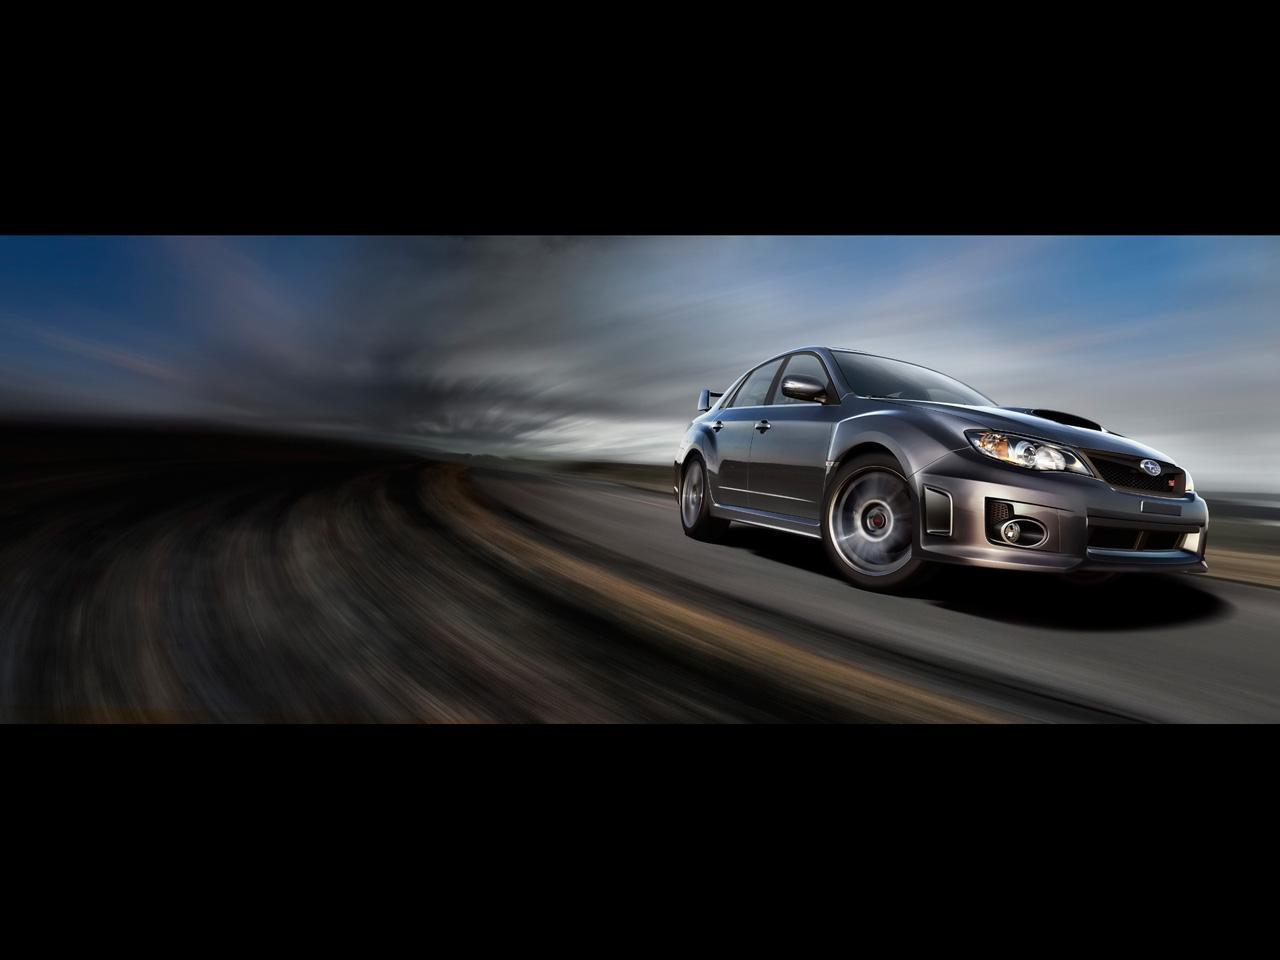 2011 Subaru Impreza Wrx Sti Wallpapers By Cars Wallpapers Net